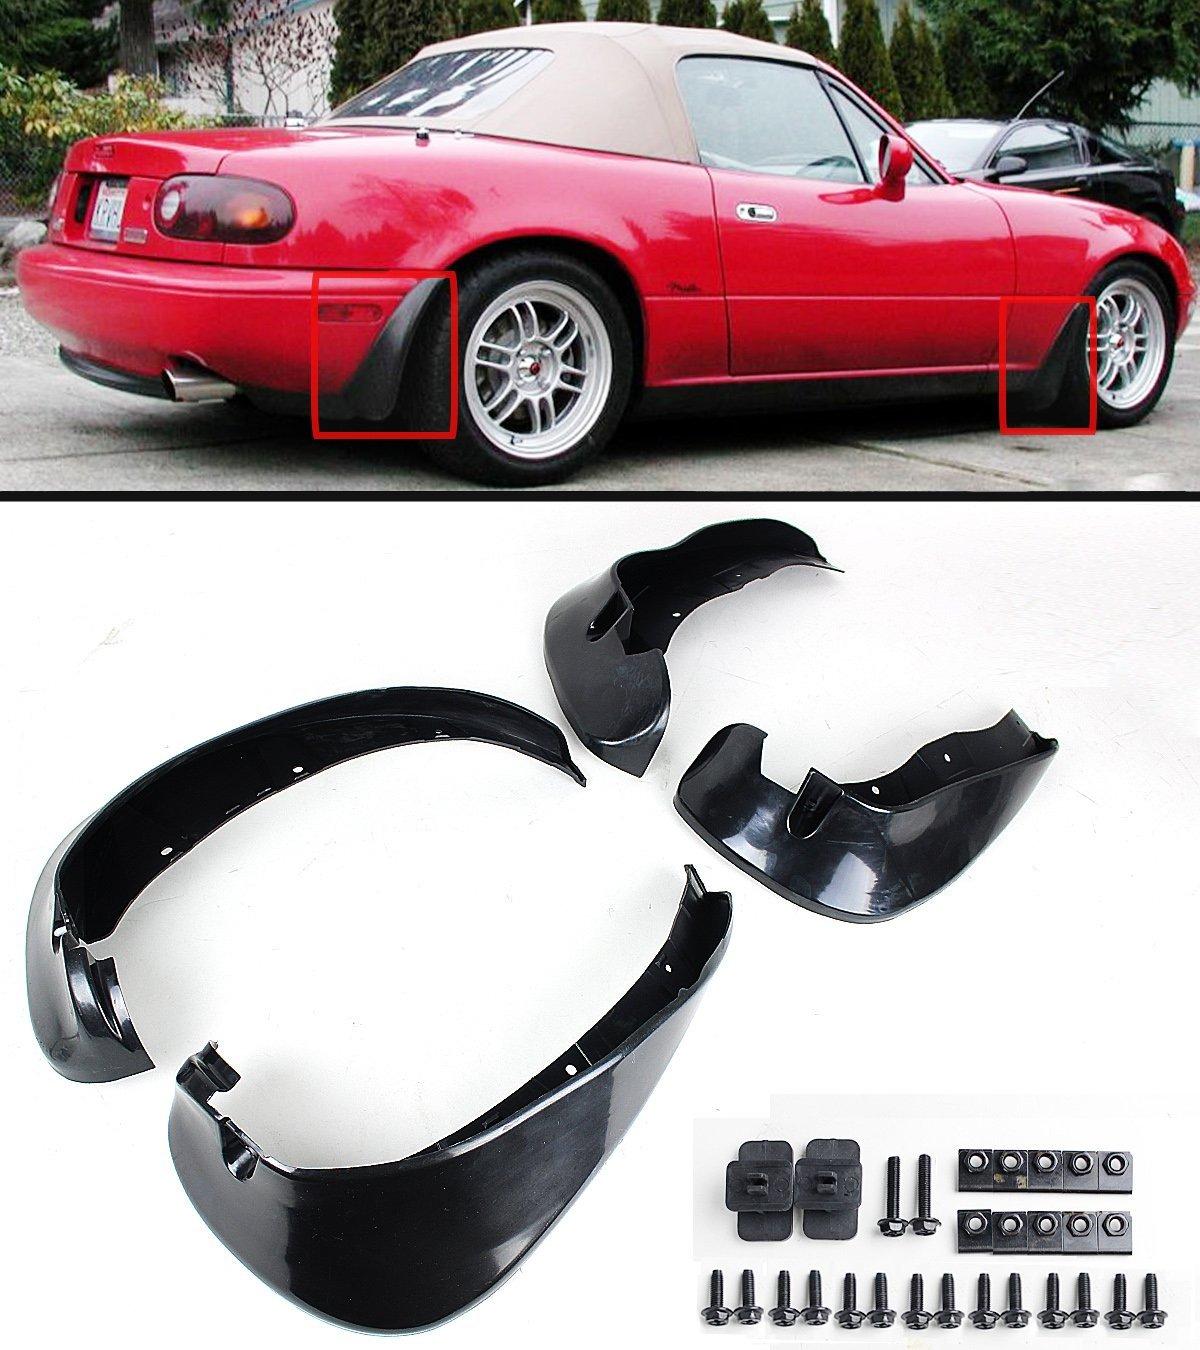 Spec-D Tuning Mazda Miata 1990 1991 1992 1993 1994 1995 1996 1997 Altezza Tail Lights Black